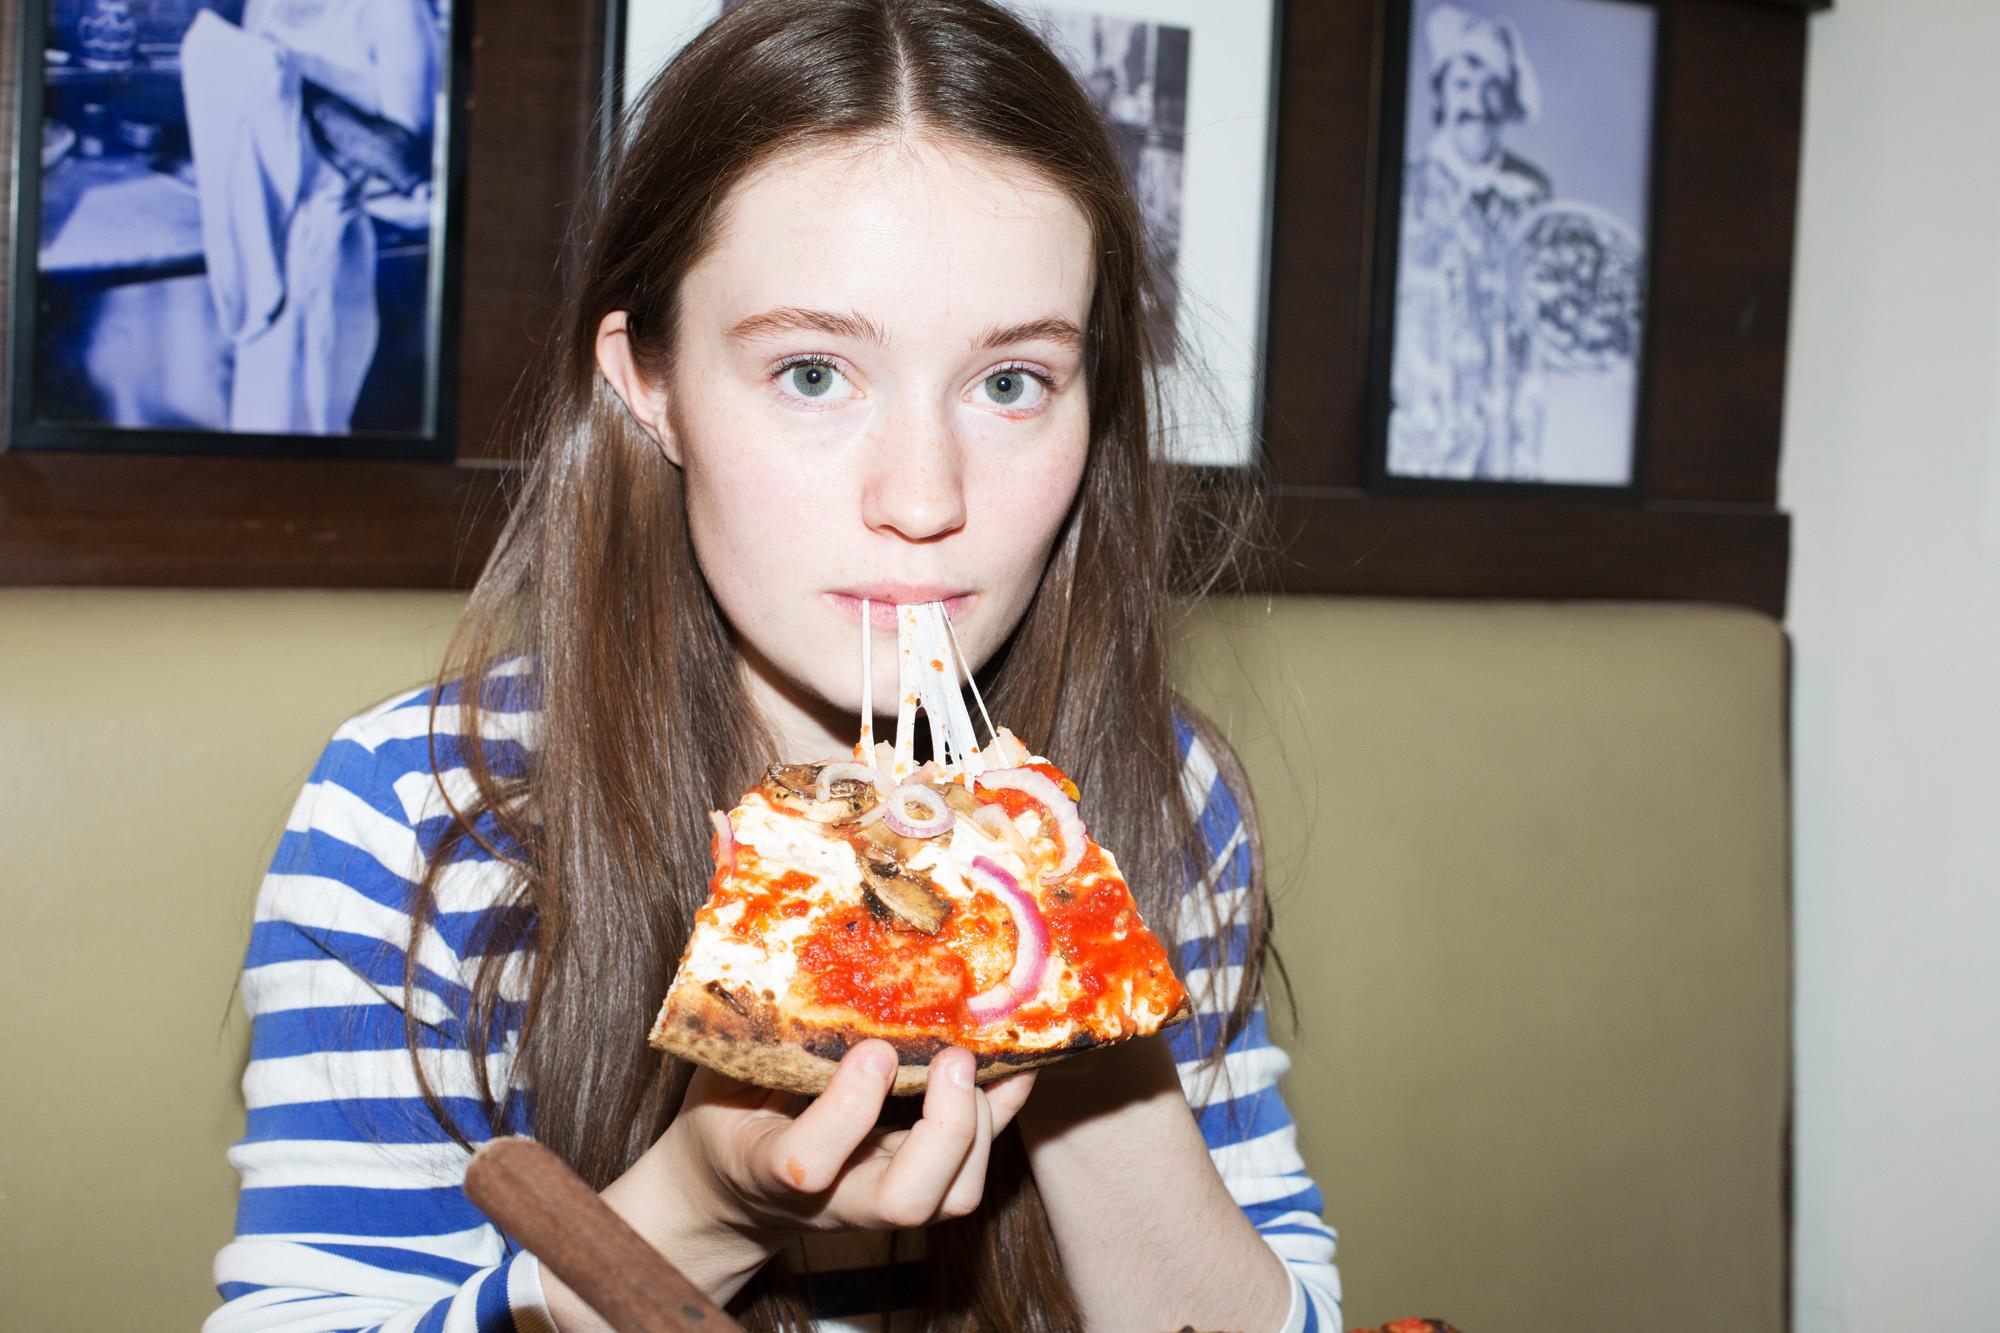 Afbeeldingsresultaat voor sigrid eating